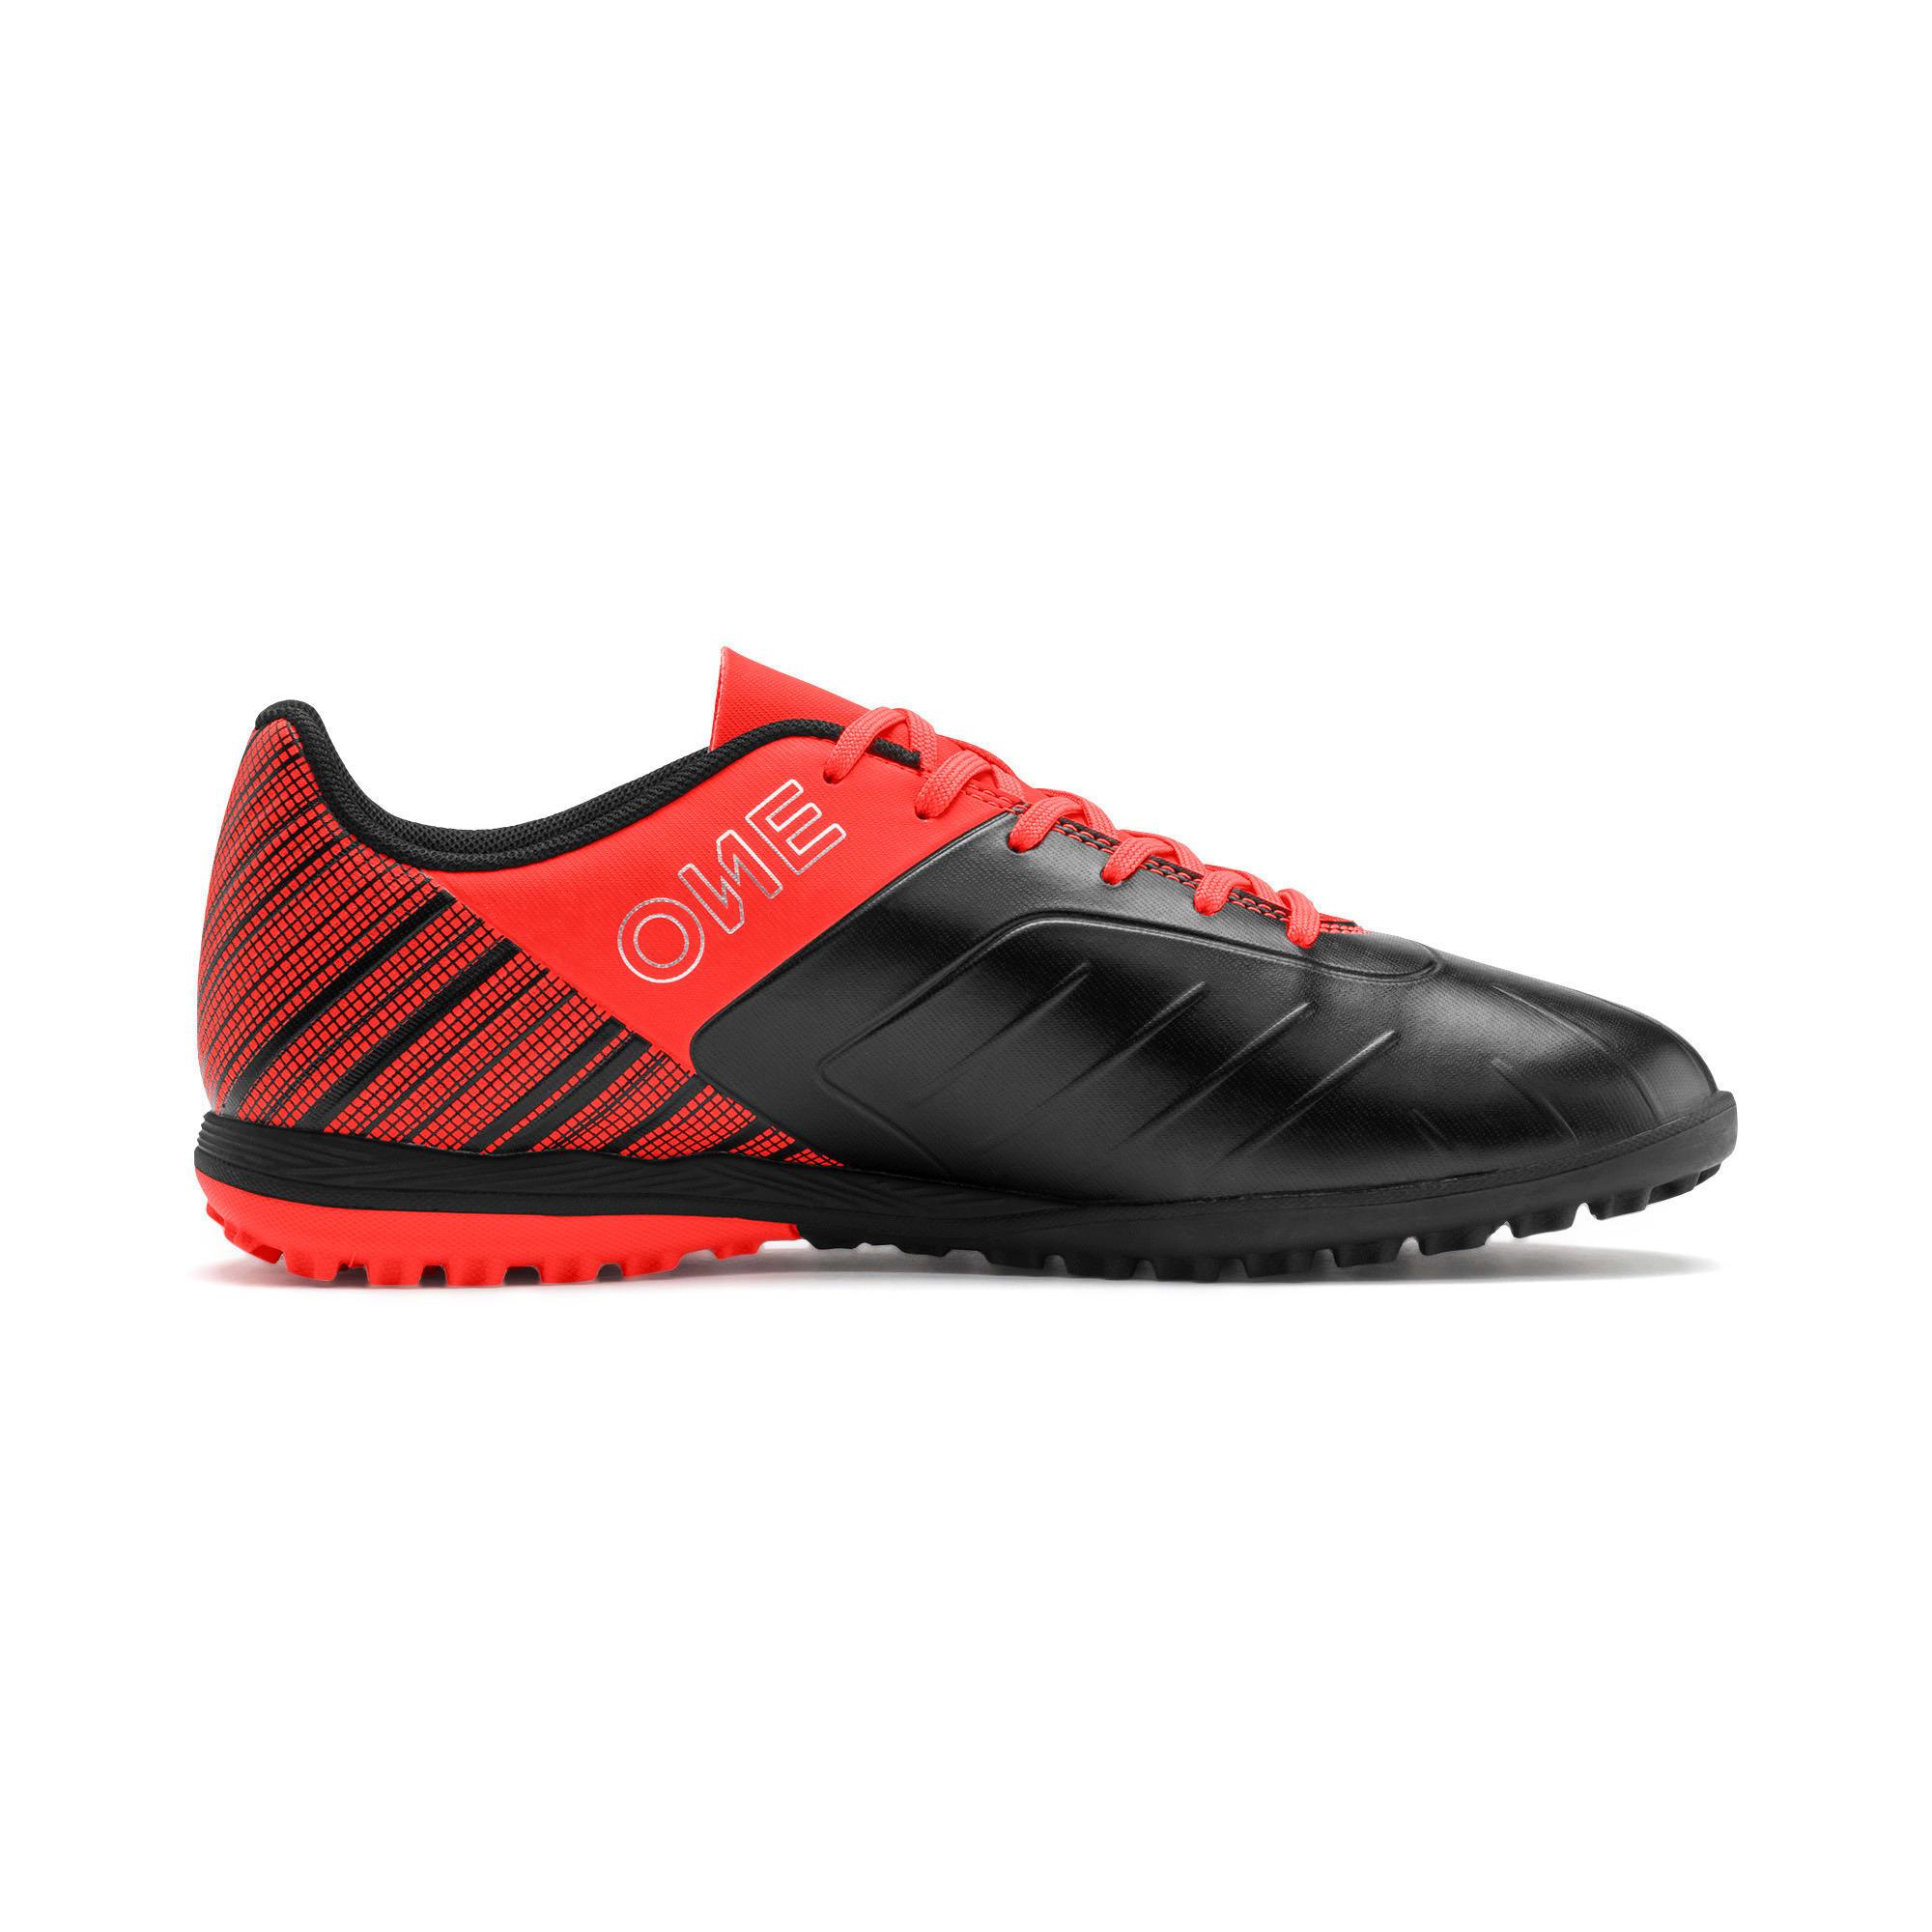 Thumbnail 6 of PUMA ONE 5.4 TT Men's Football Boots, Black-Nrgy Red-Aged Silver, medium